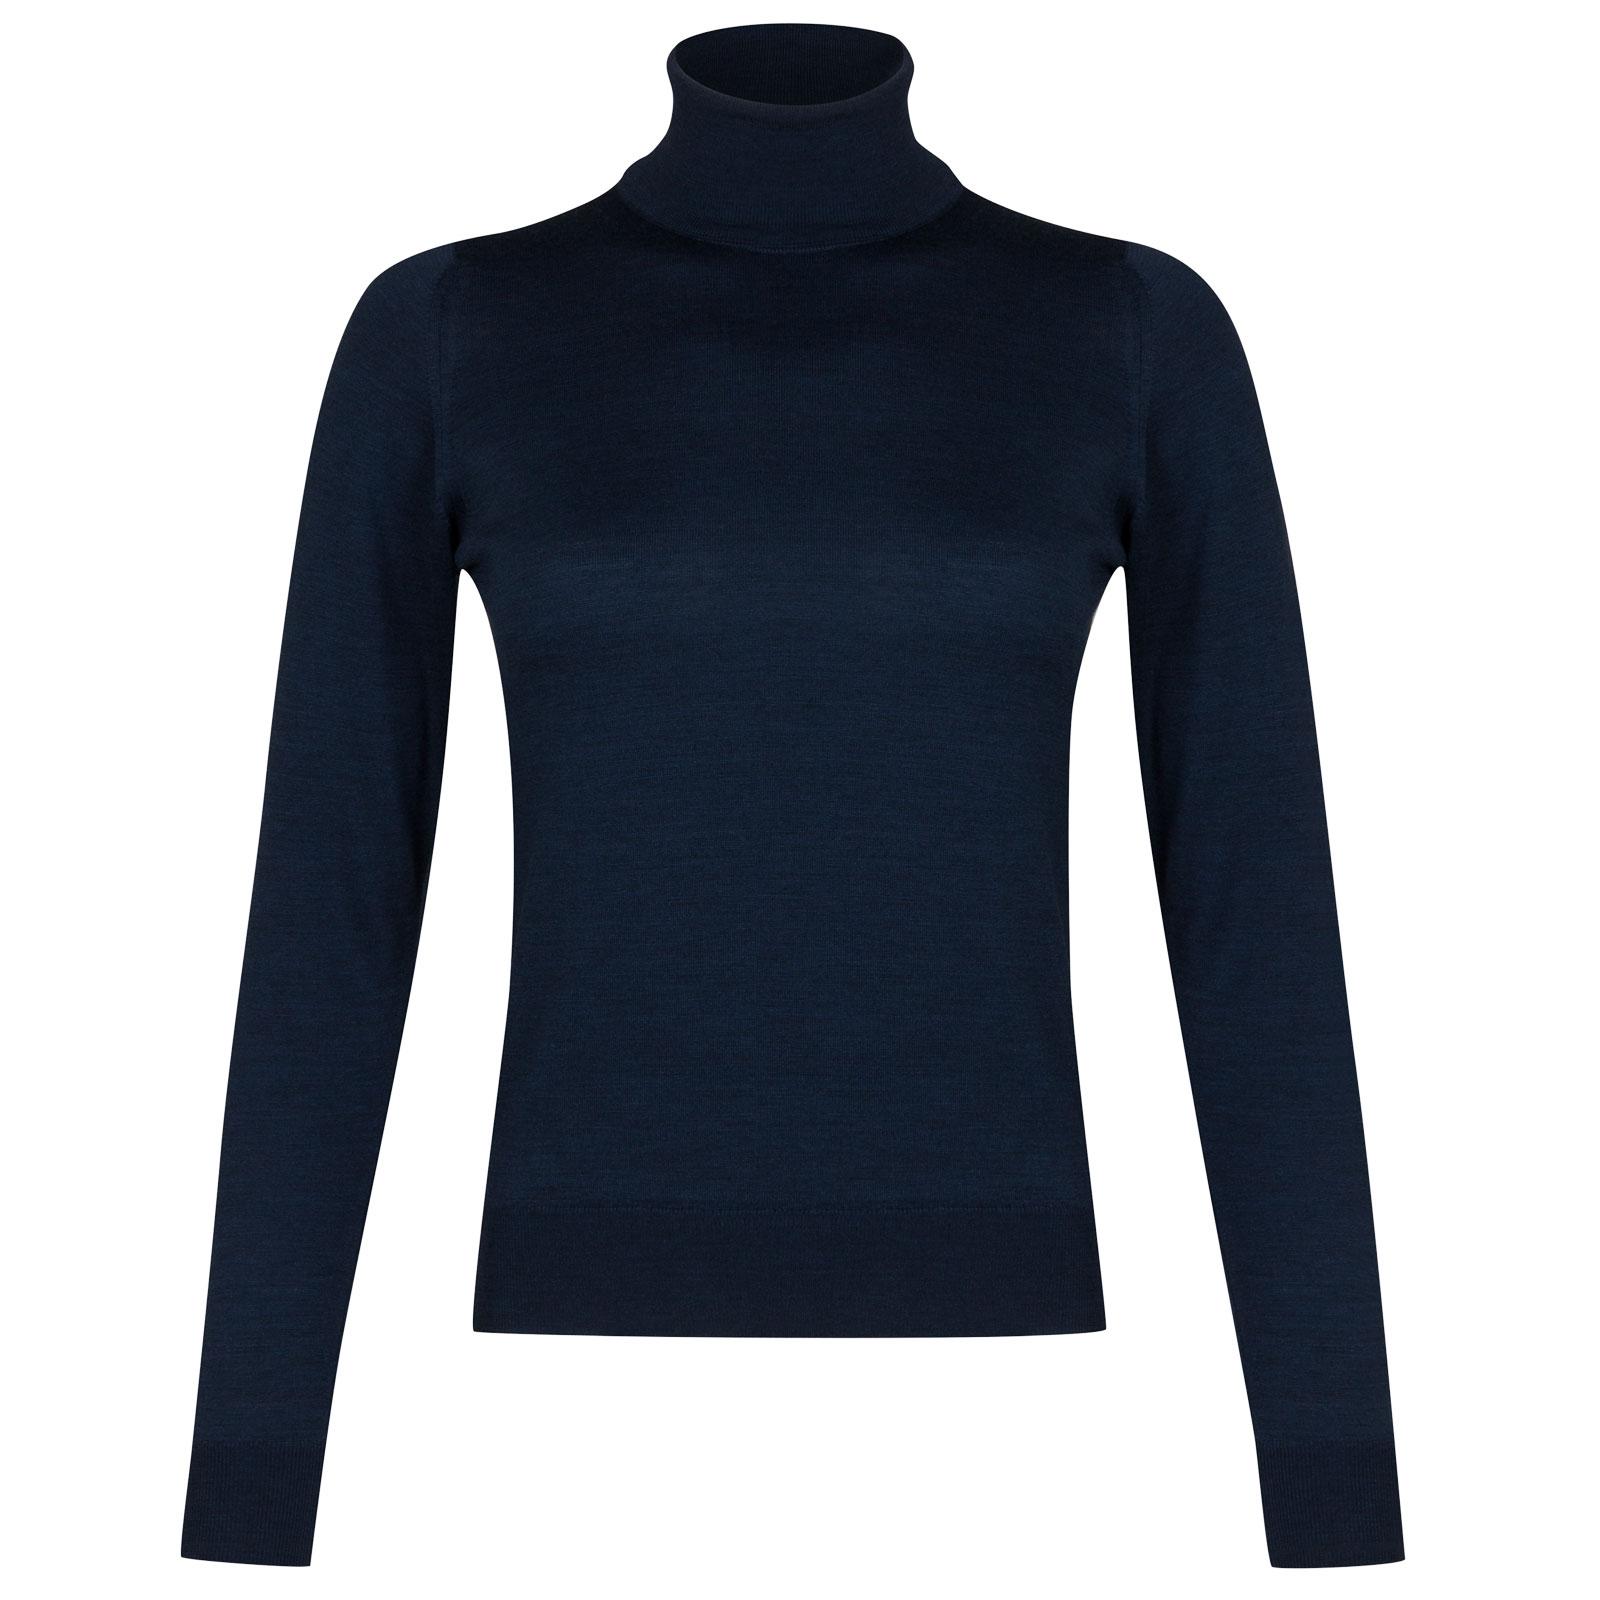 John Smedley siena Merino Wool Sweater in Indigo-S